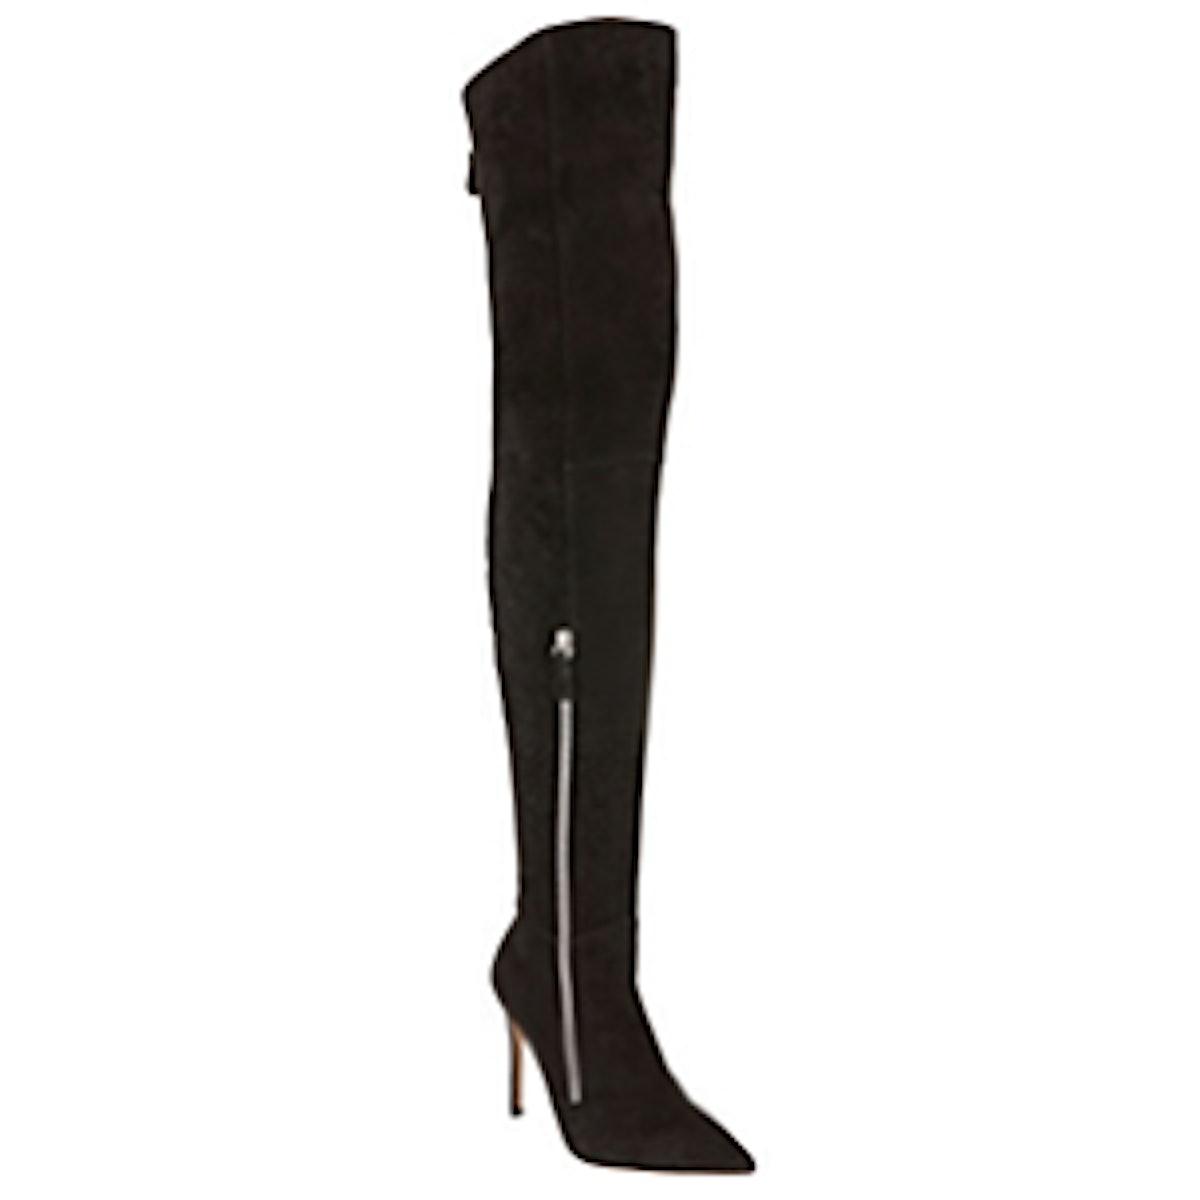 Double Zip Over The Knee Boots